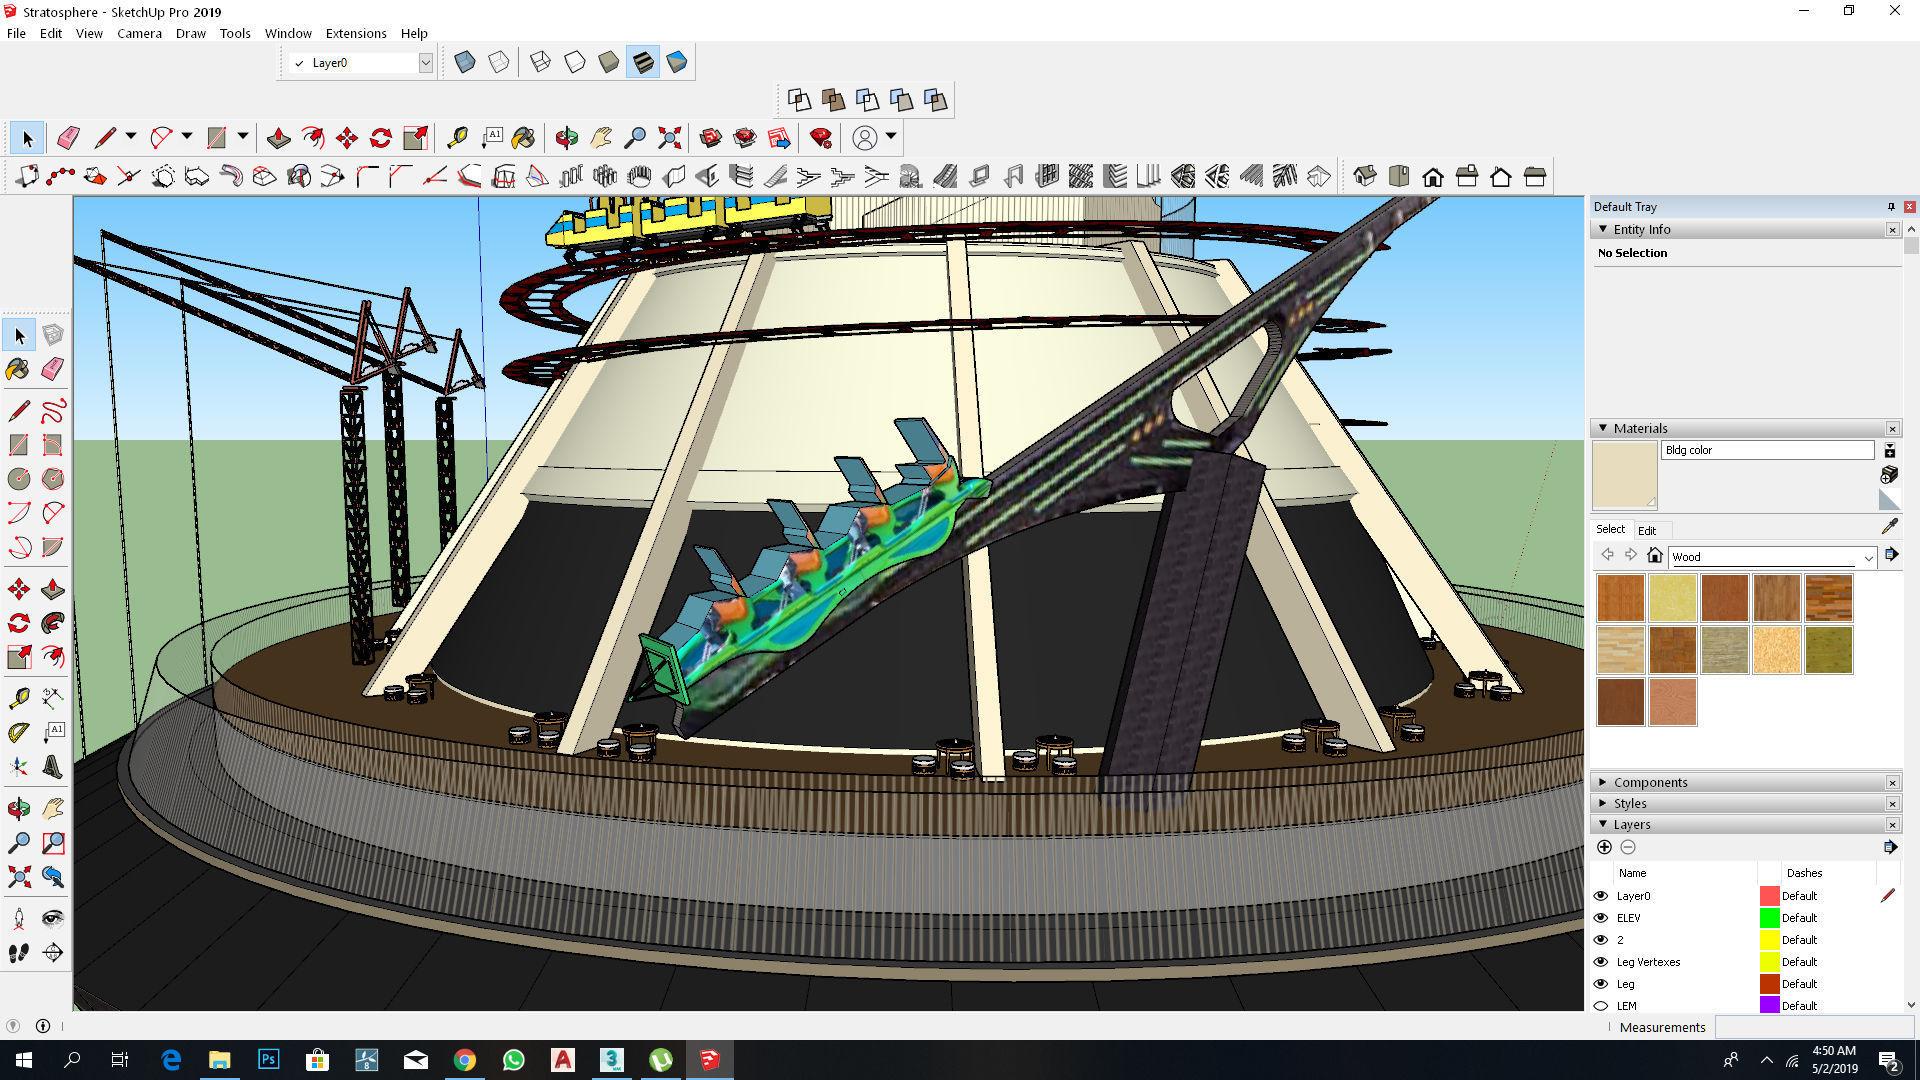 Stratosphere Casino Sketchup Model   3D model